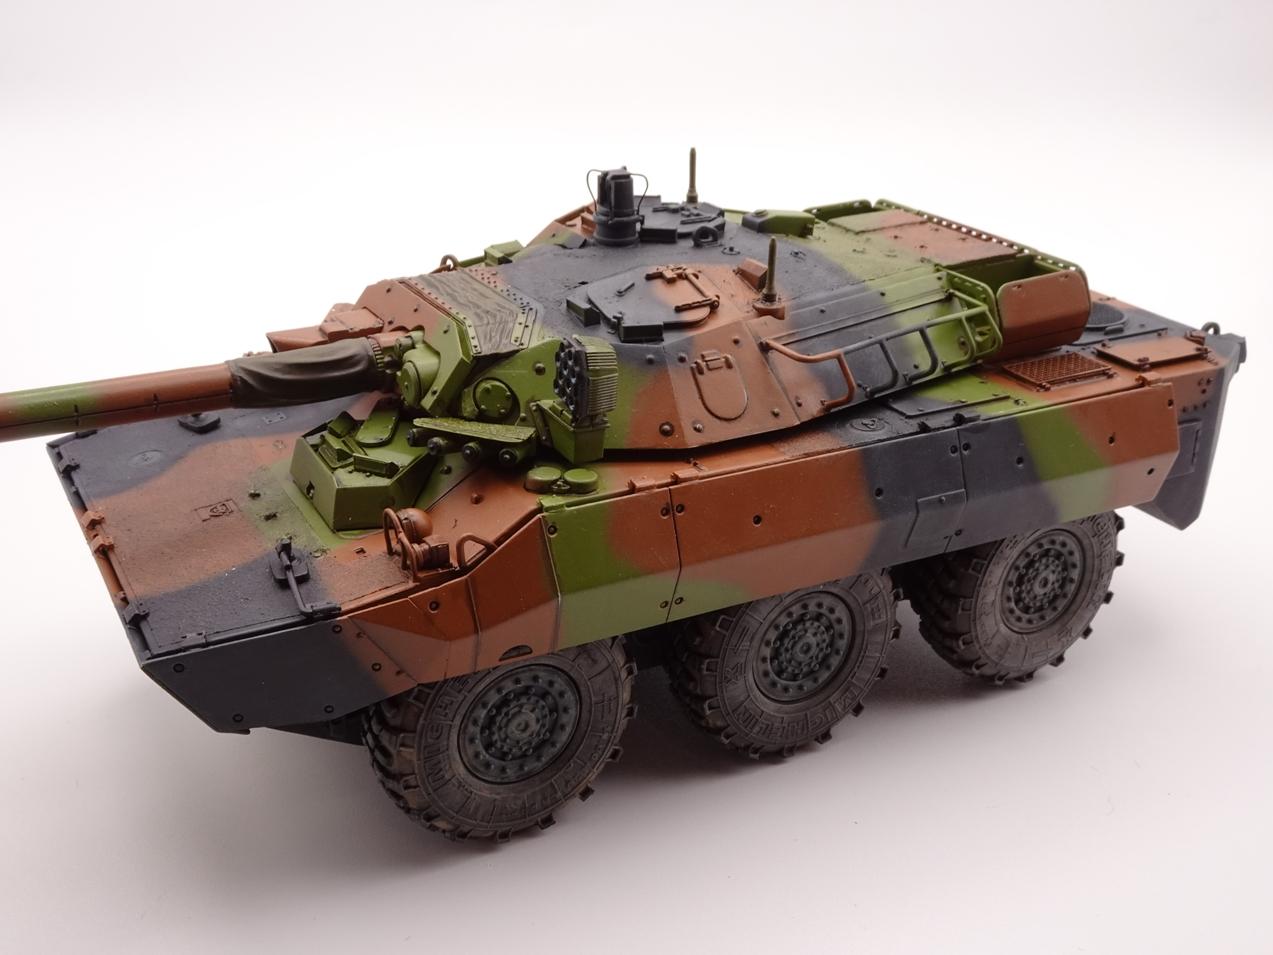 [Tiger Model] AMX-10RCR réf. 4602 - 1/35 - Page 4 Amx10-0908-2